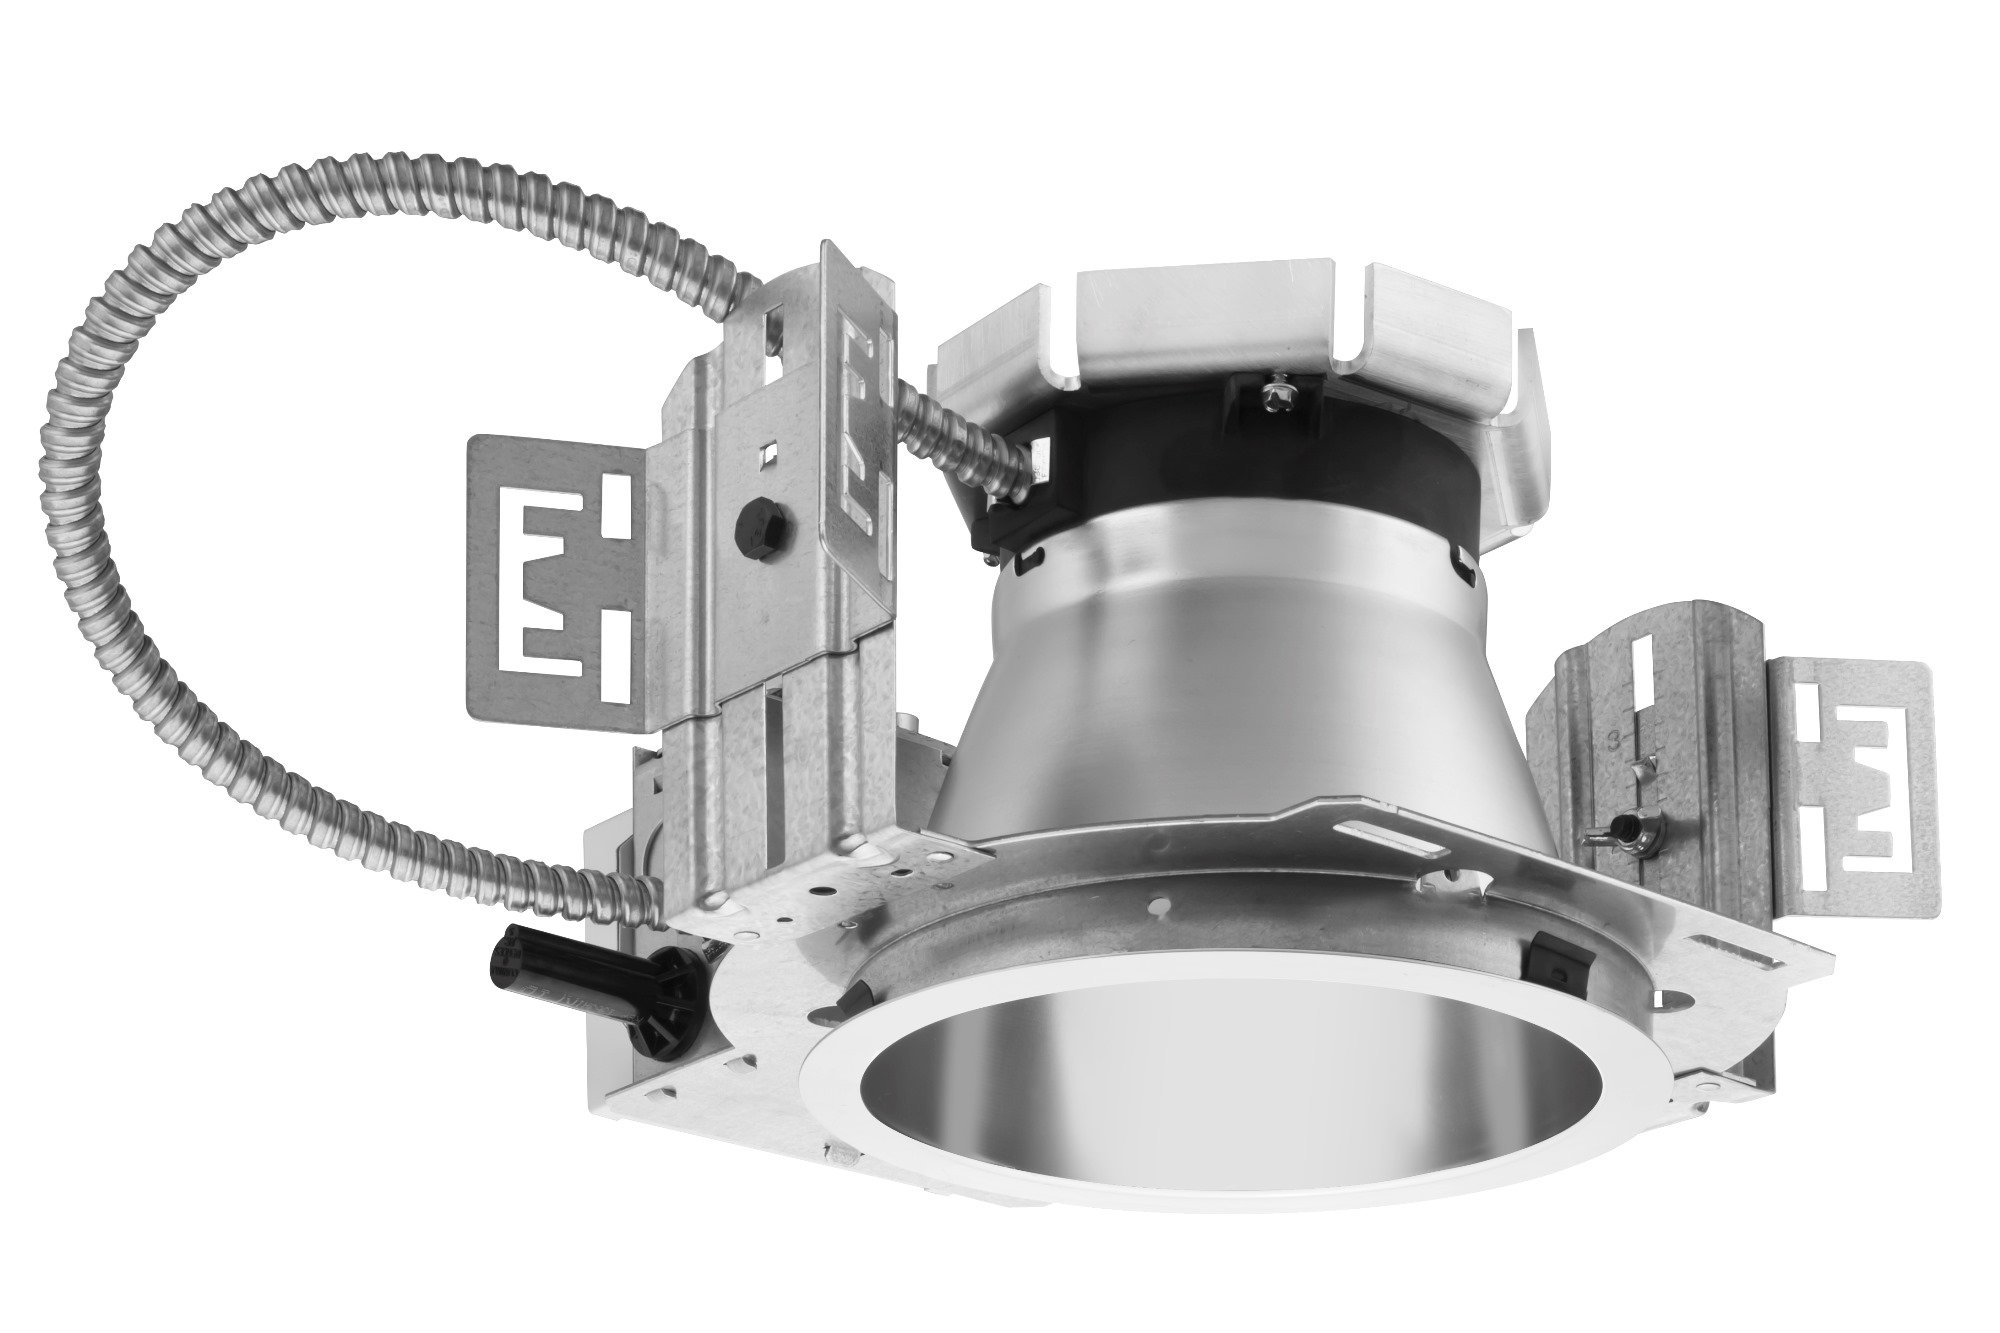 Lithonia Lighting LDN6 35/06 277 HSG LED Gen 1-Recessed Housing, 277-Volt, 600 Lumens